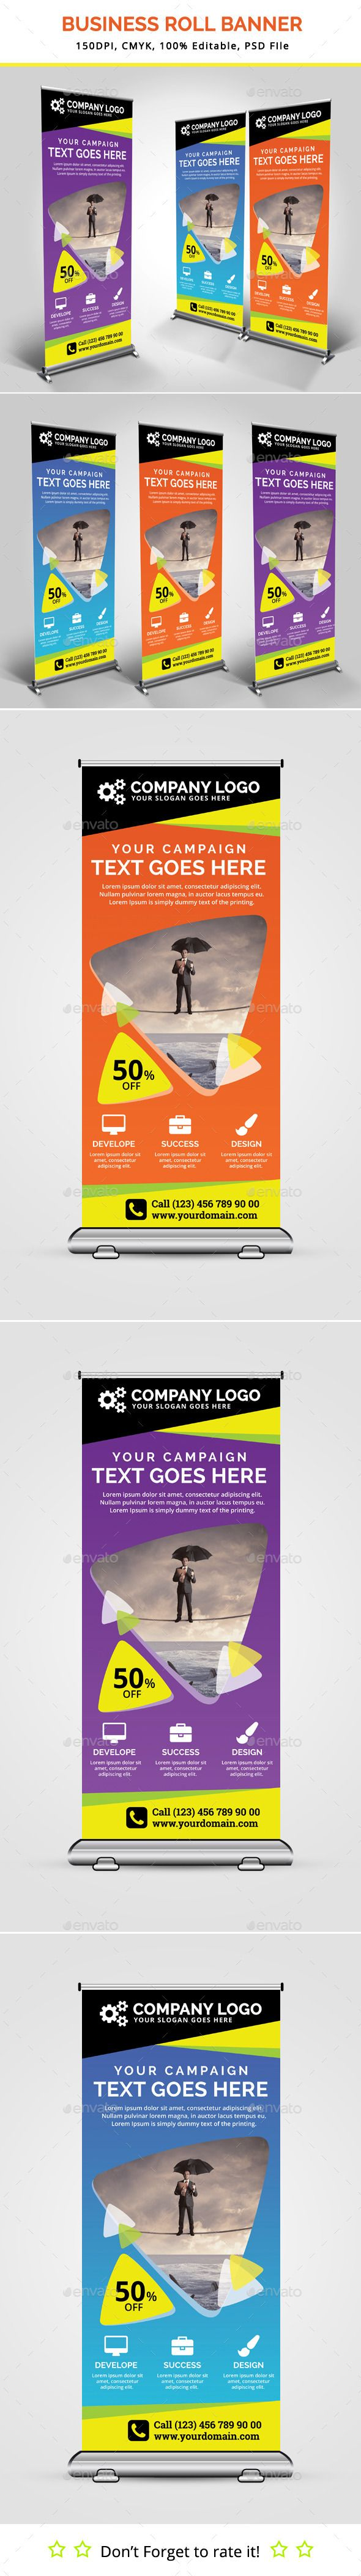 Business Roll Up Banner Template #design Download: http://graphicriver.net/item/business-roll-up-banner-v14/12676785?ref=ksioks